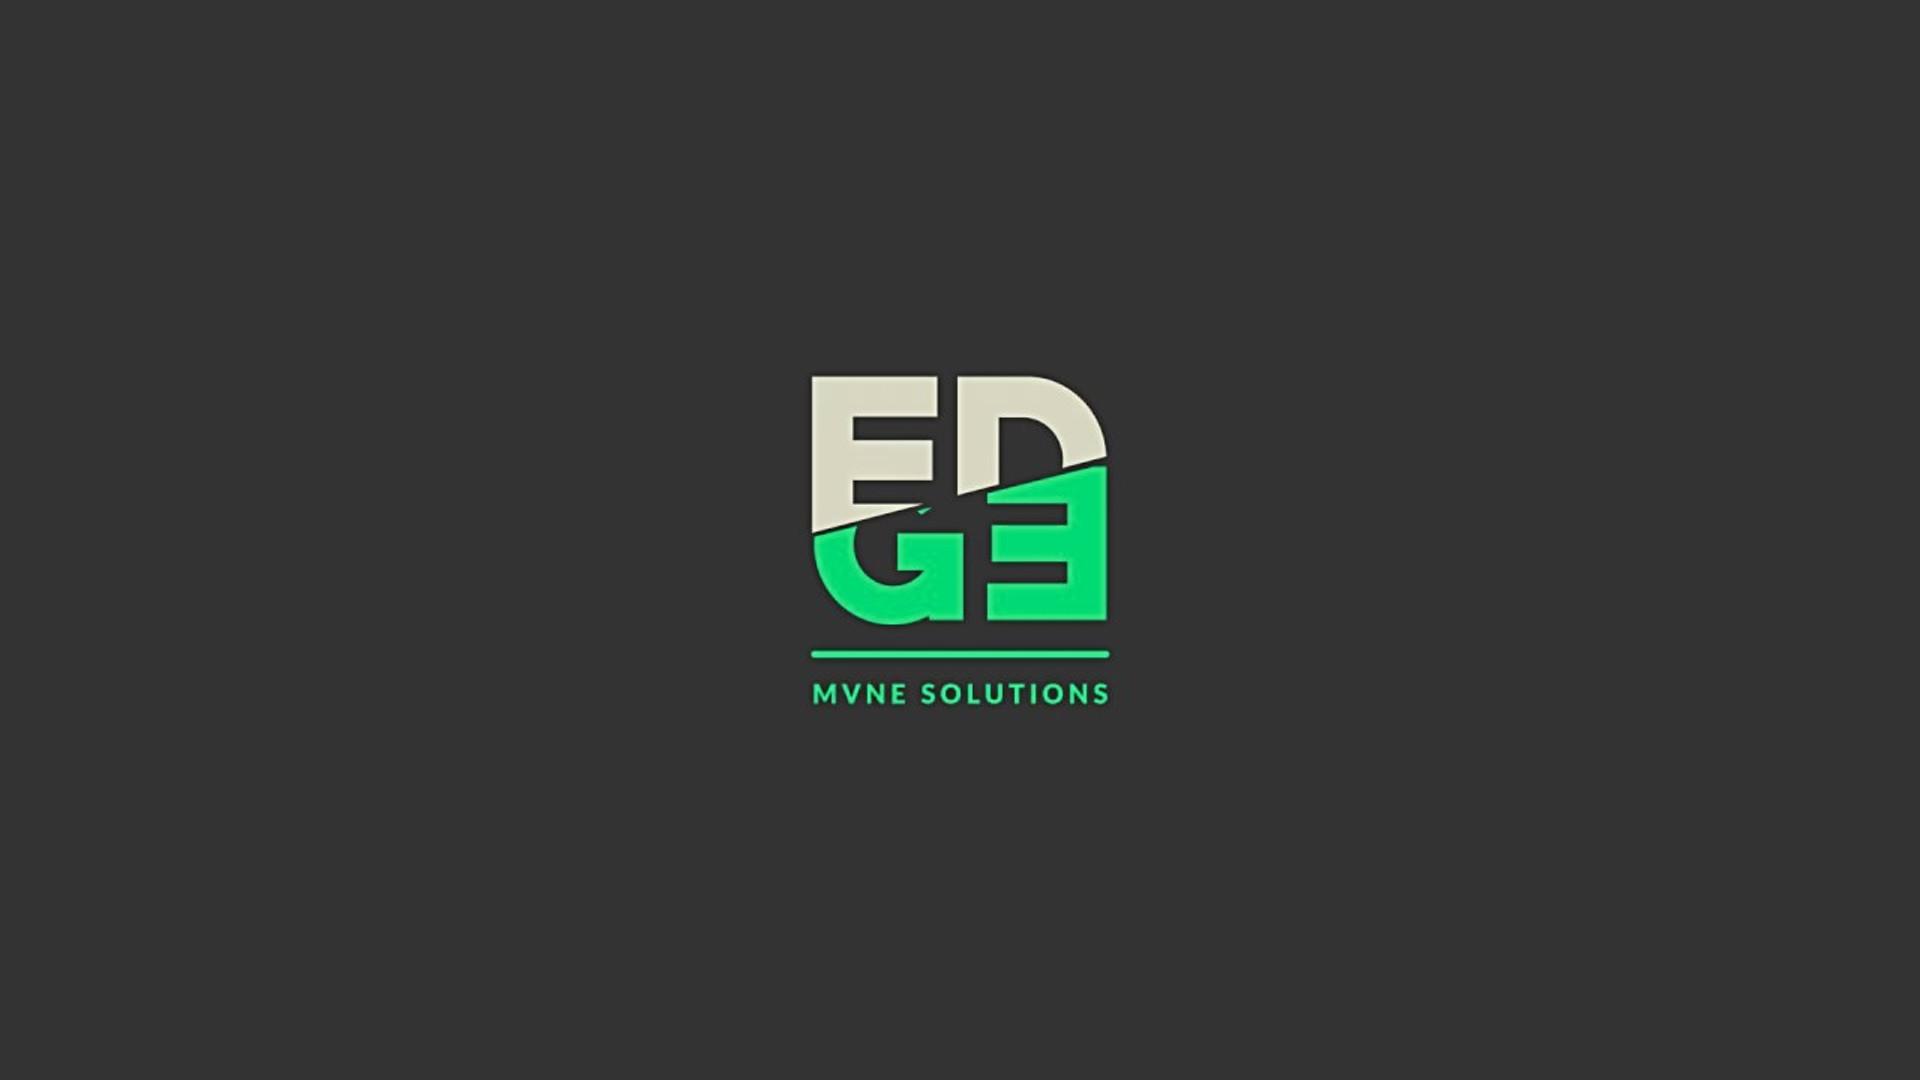 EDGE MVNO marketing